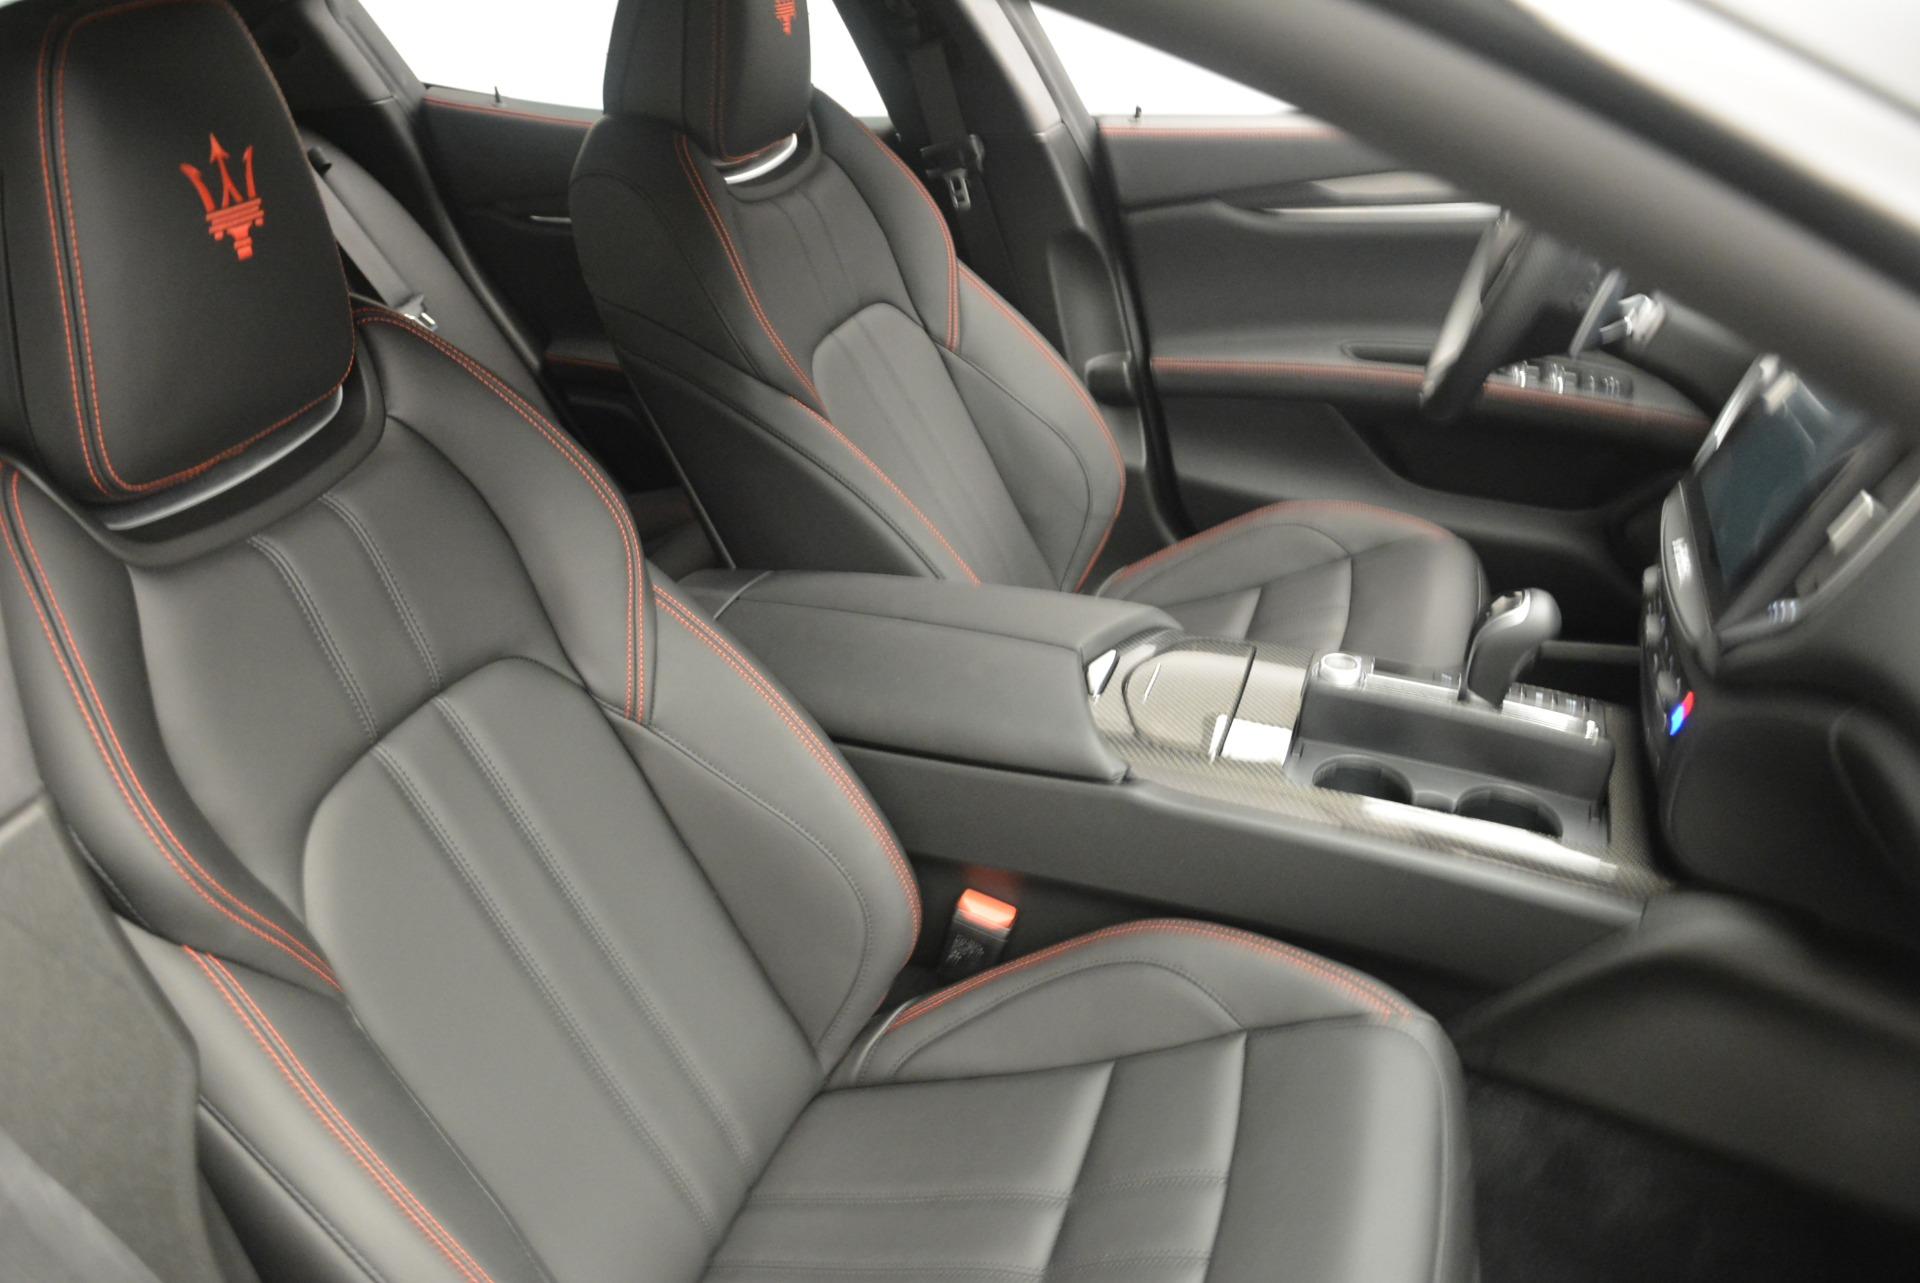 New-2018-Maserati-Ghibli-SQ4-GranSport-Nerissimo